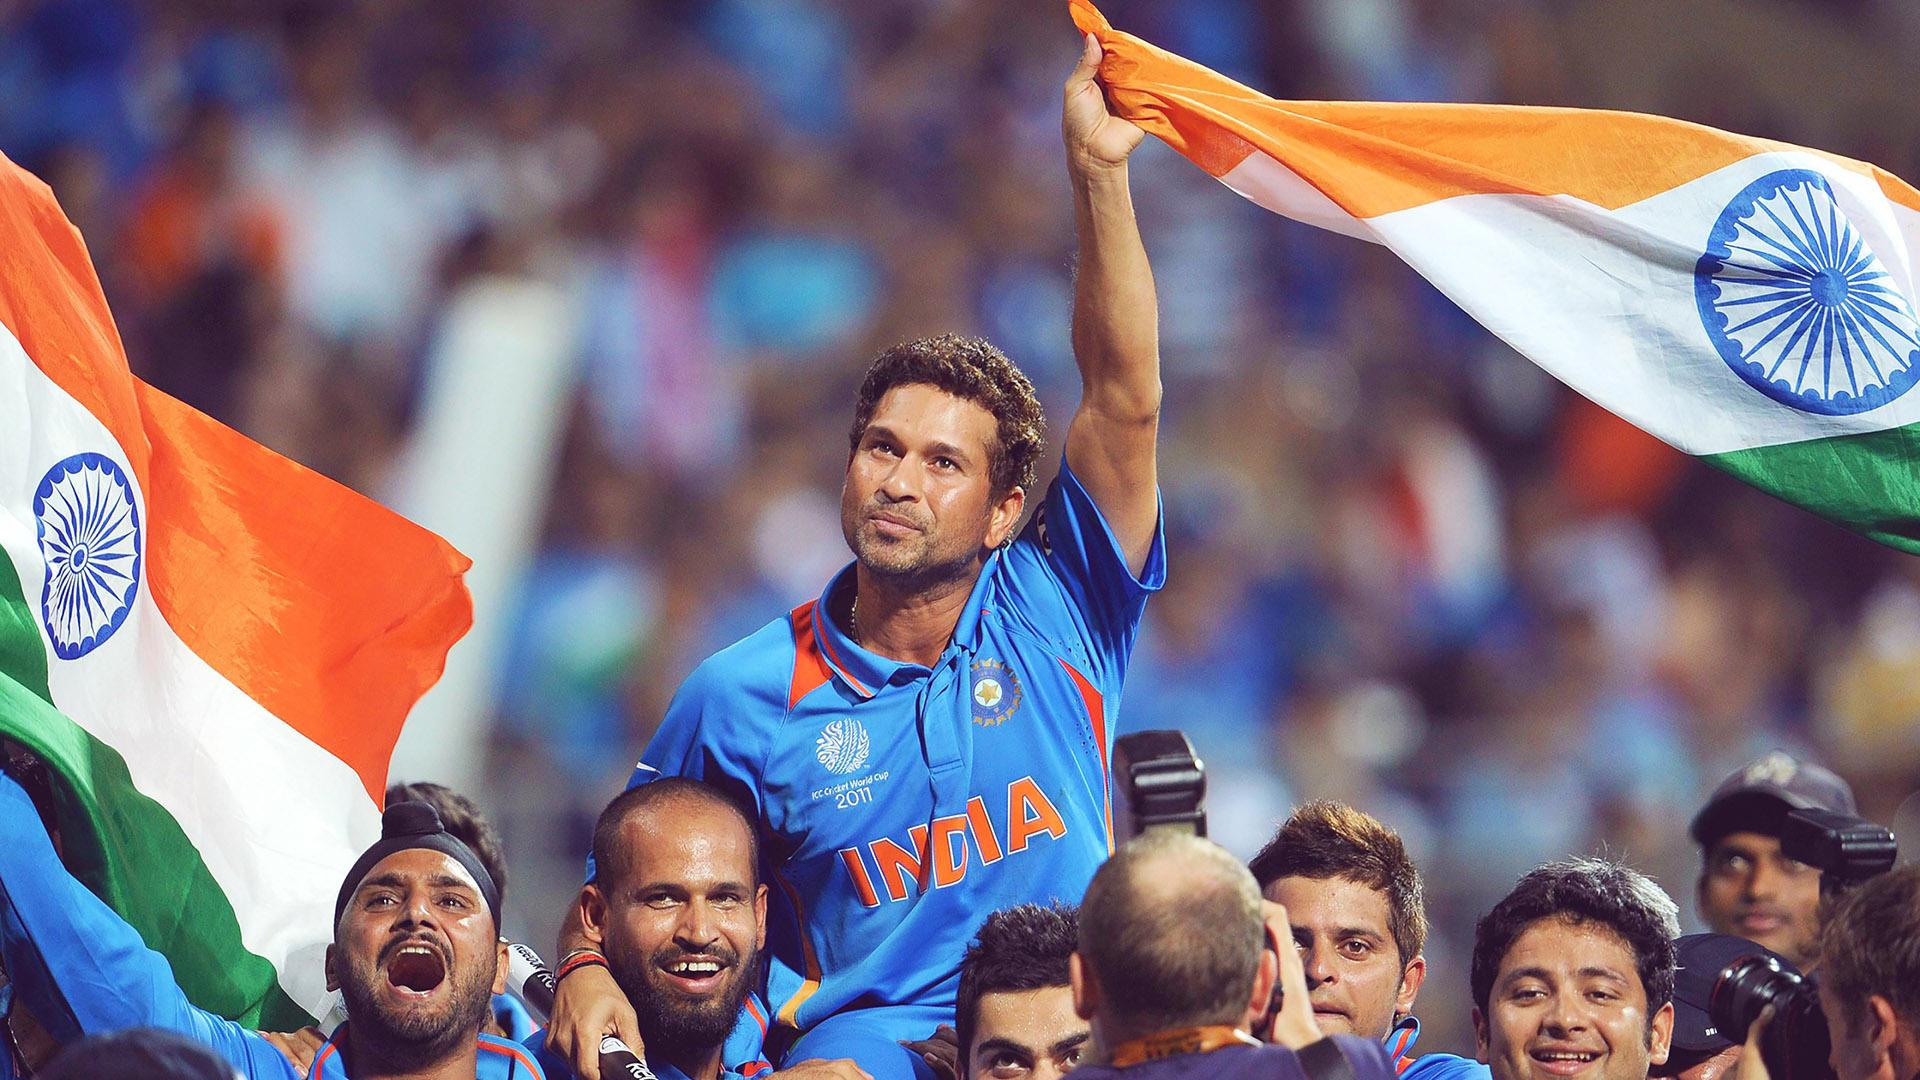 Sachin Tendulkar Celebrating 2011 Cricket World Cup India with Indian Flag